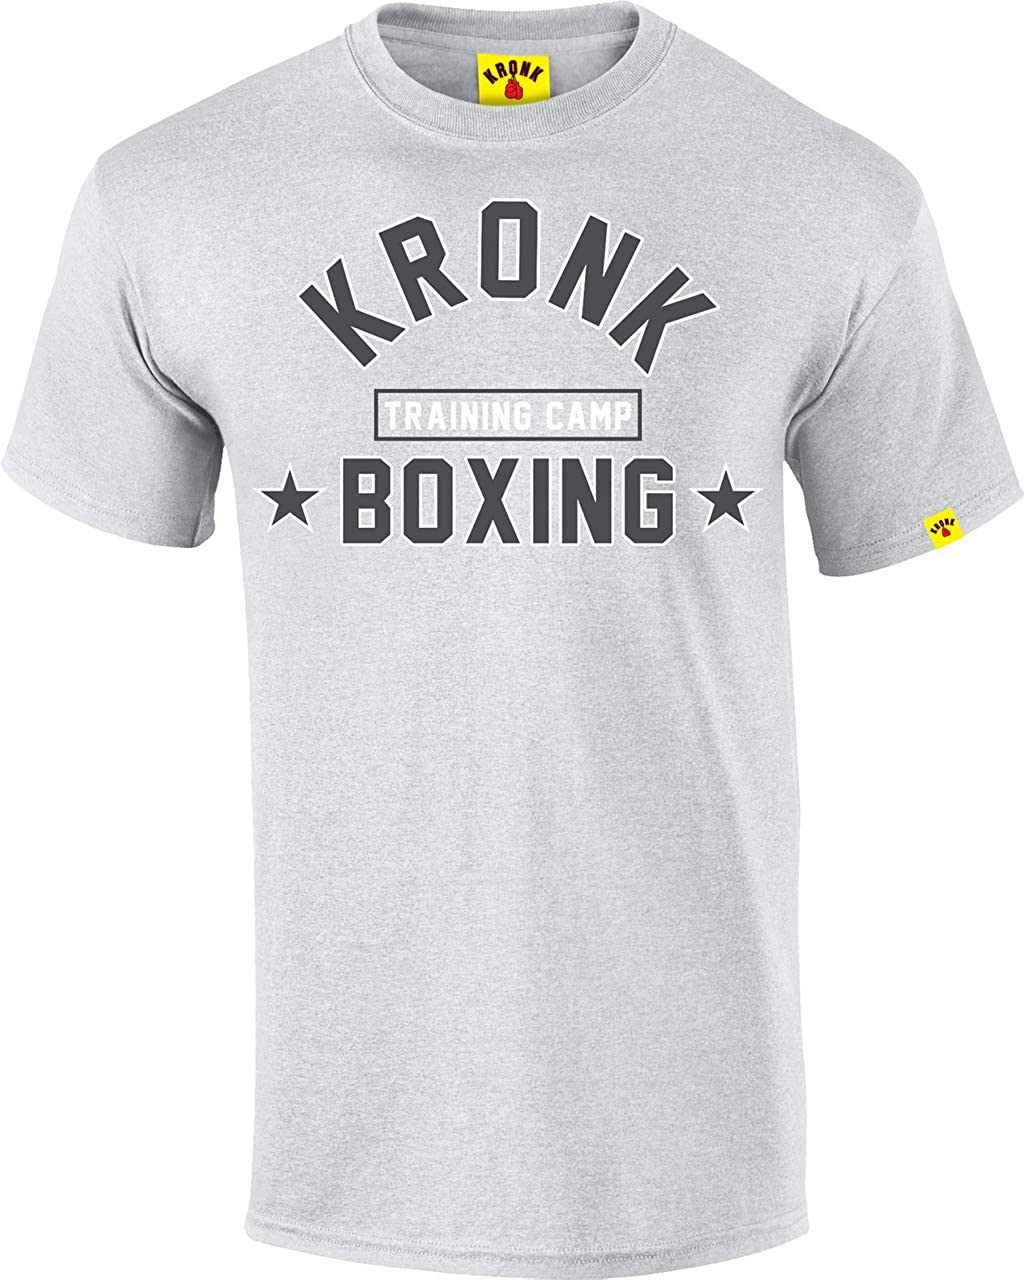 KRONK Training Camp Camiseta de Corte Regular para Hombre